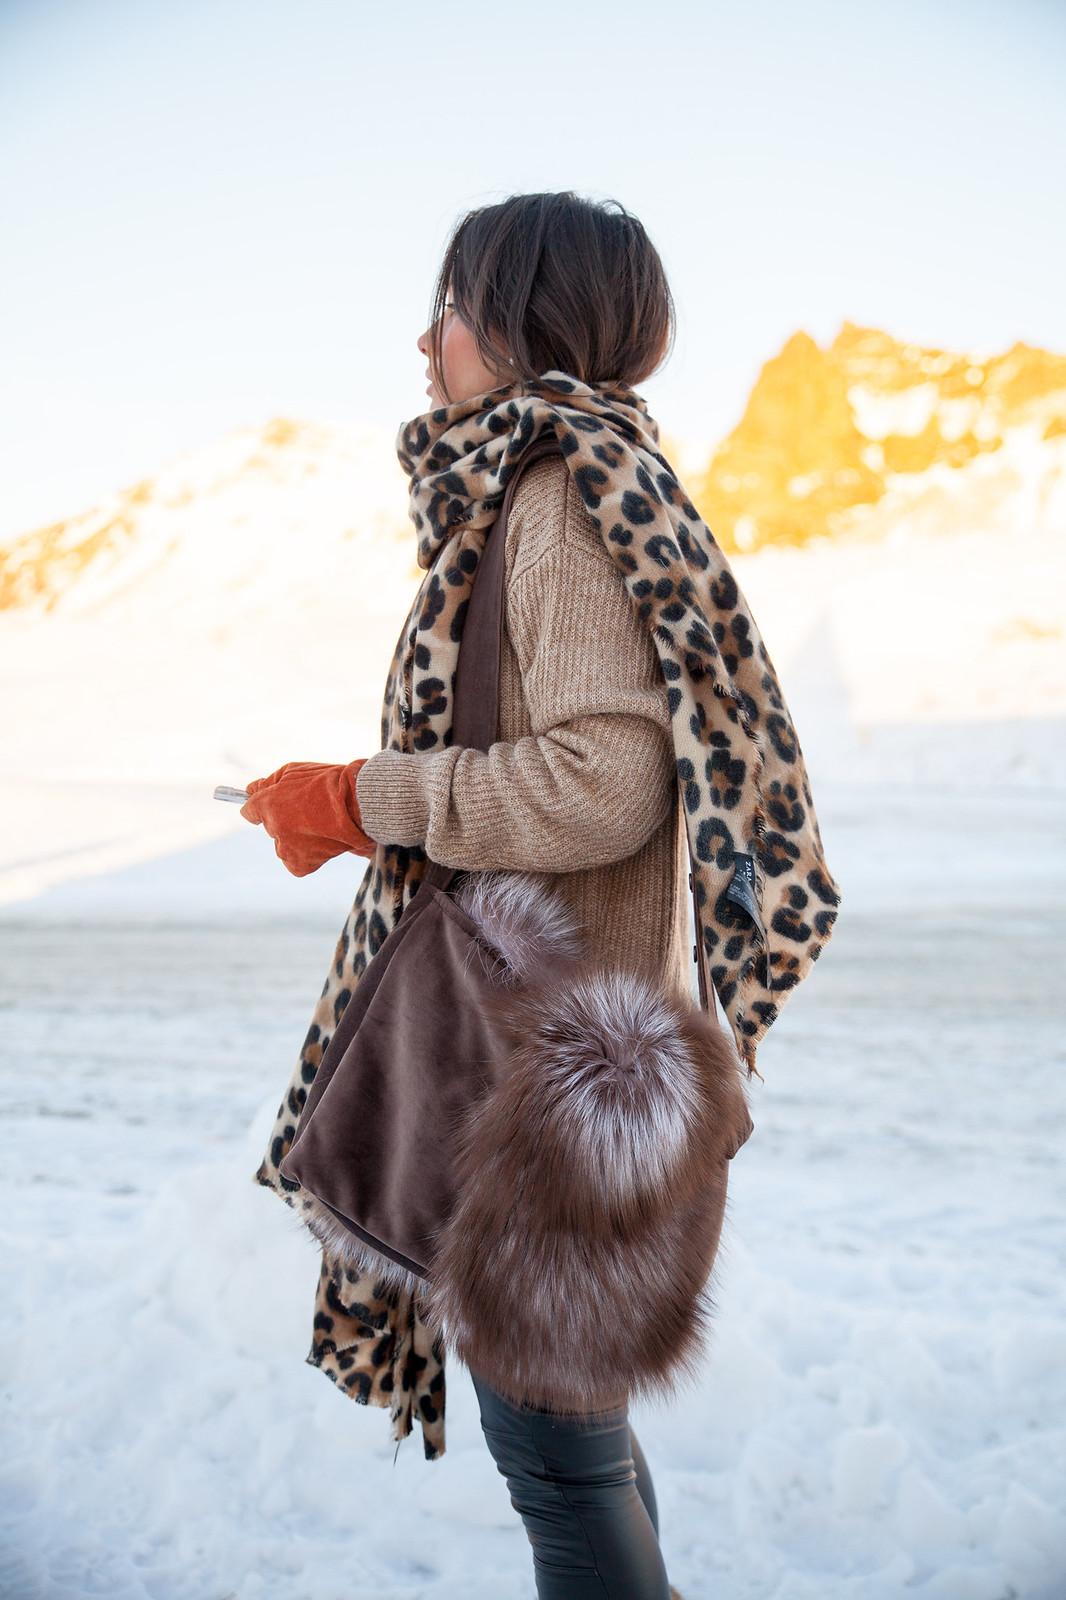 iceland theguestgirl laura santolaria ropa para ir a islandia diciembre auroras boreales bufanda de leopardo bolso de pelo barcelona influencer traveler